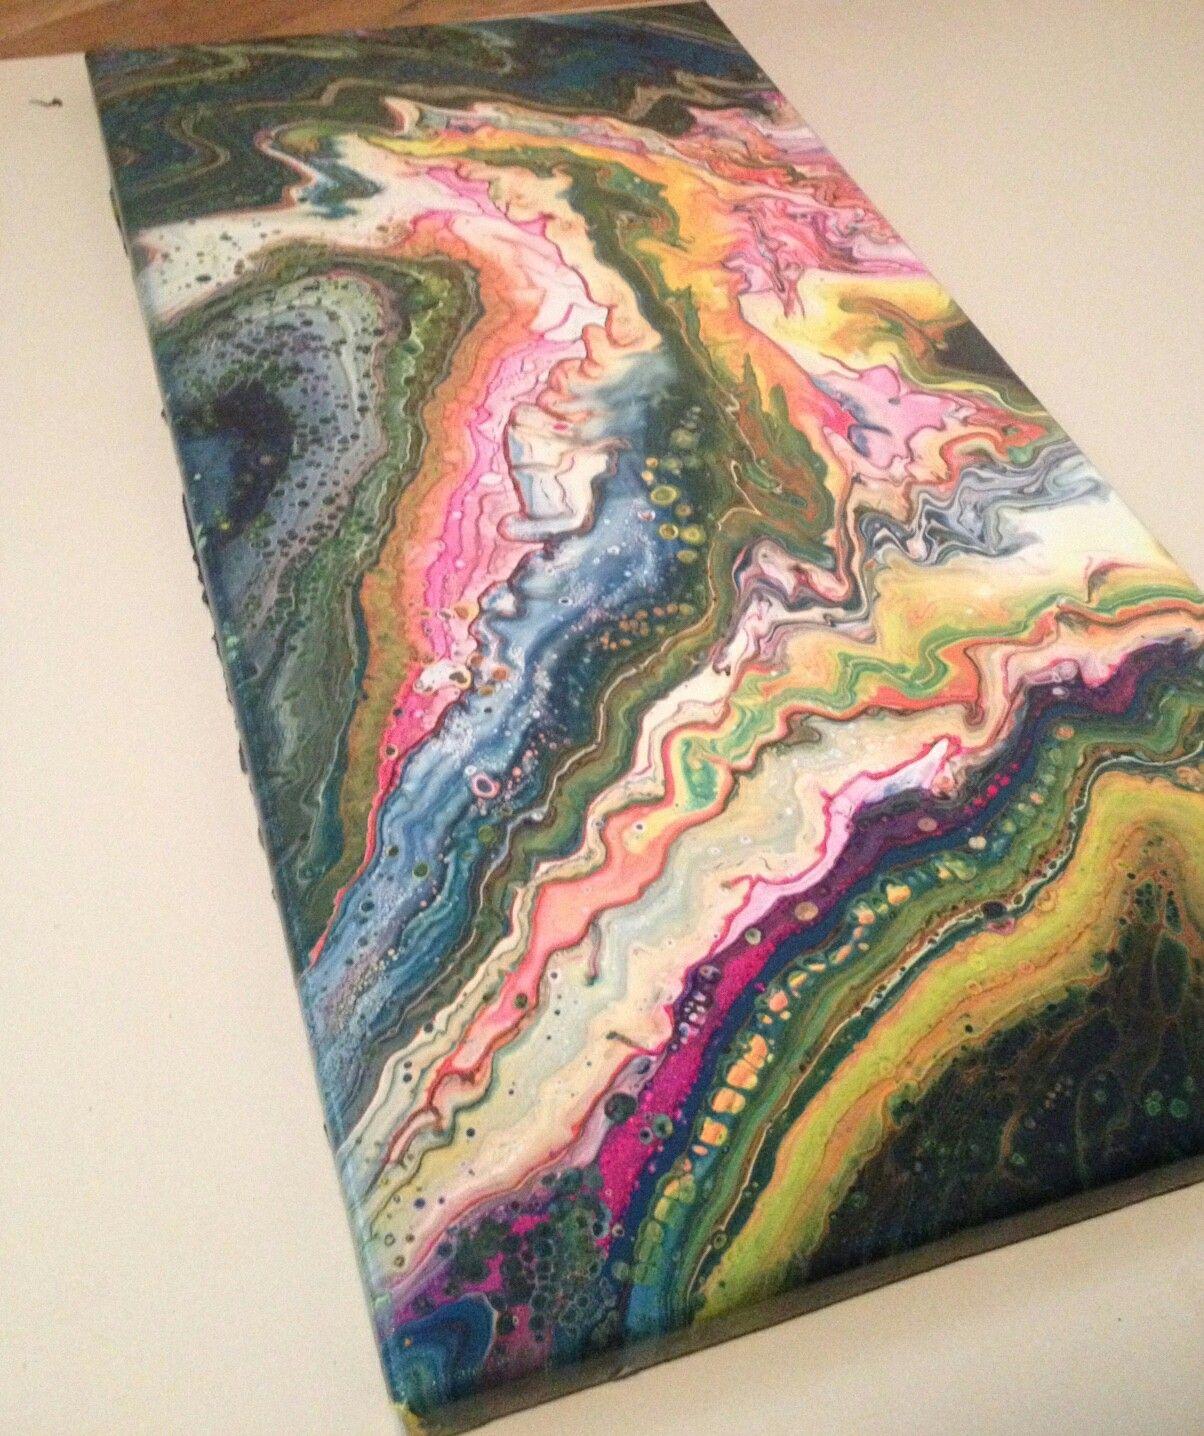 Pin by Niki Rioux on Flow art Flow arts, Art, Watercolor